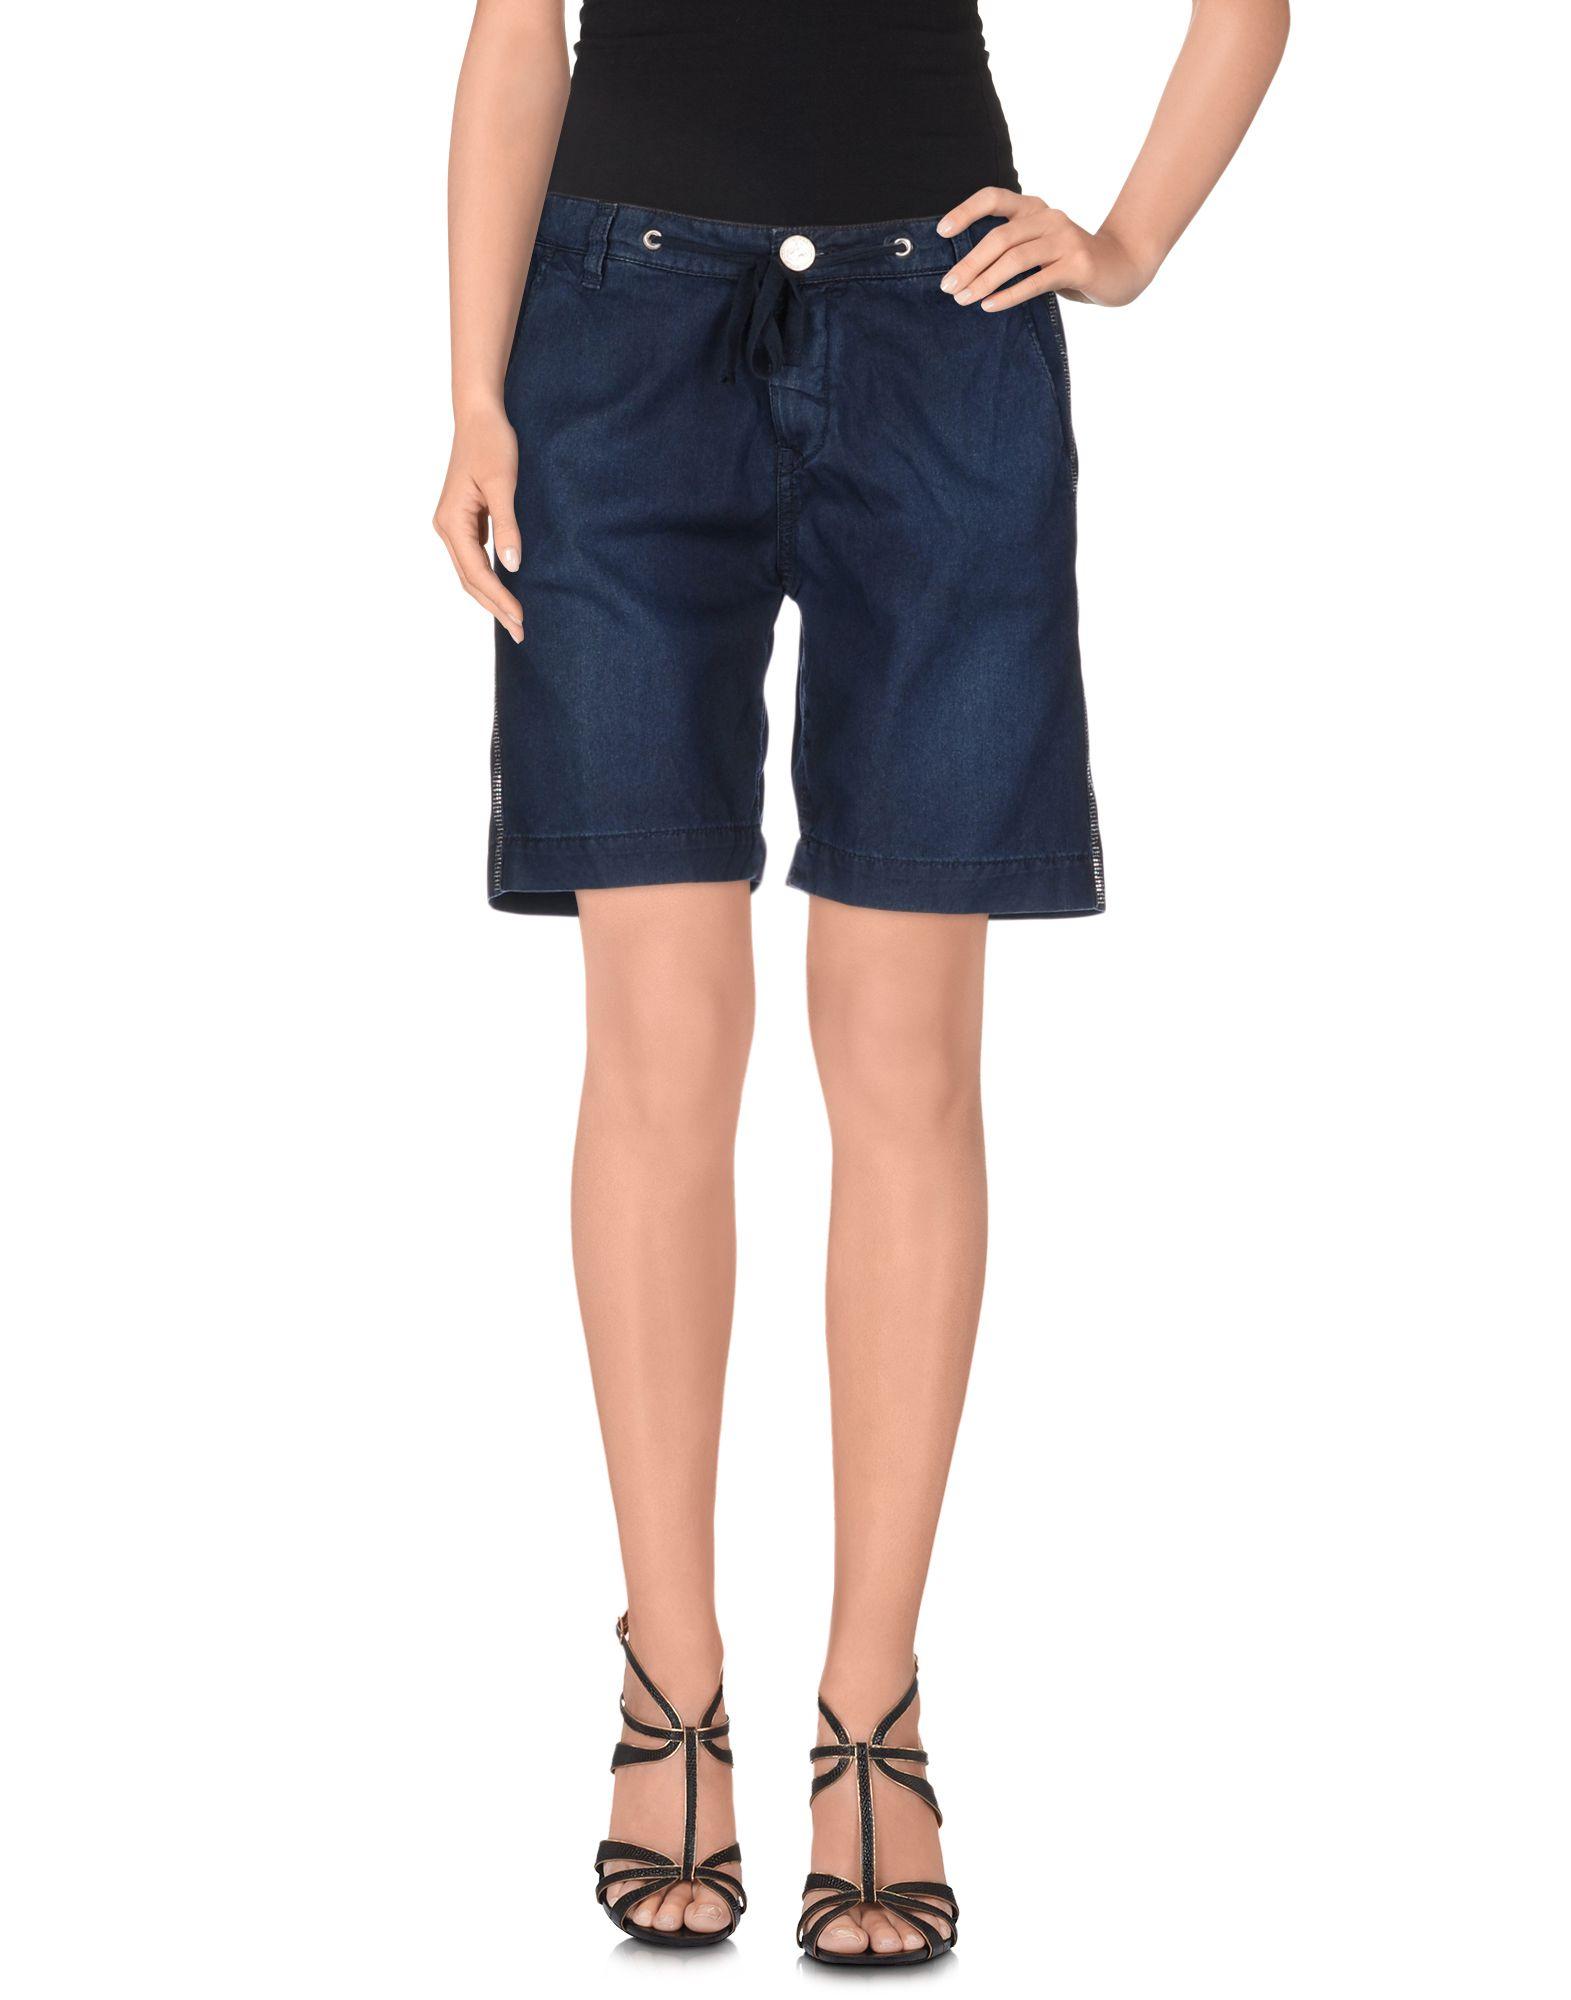 TWIN-SET JEANS Джинсовые бермуды masons jeans джинсовые бермуды